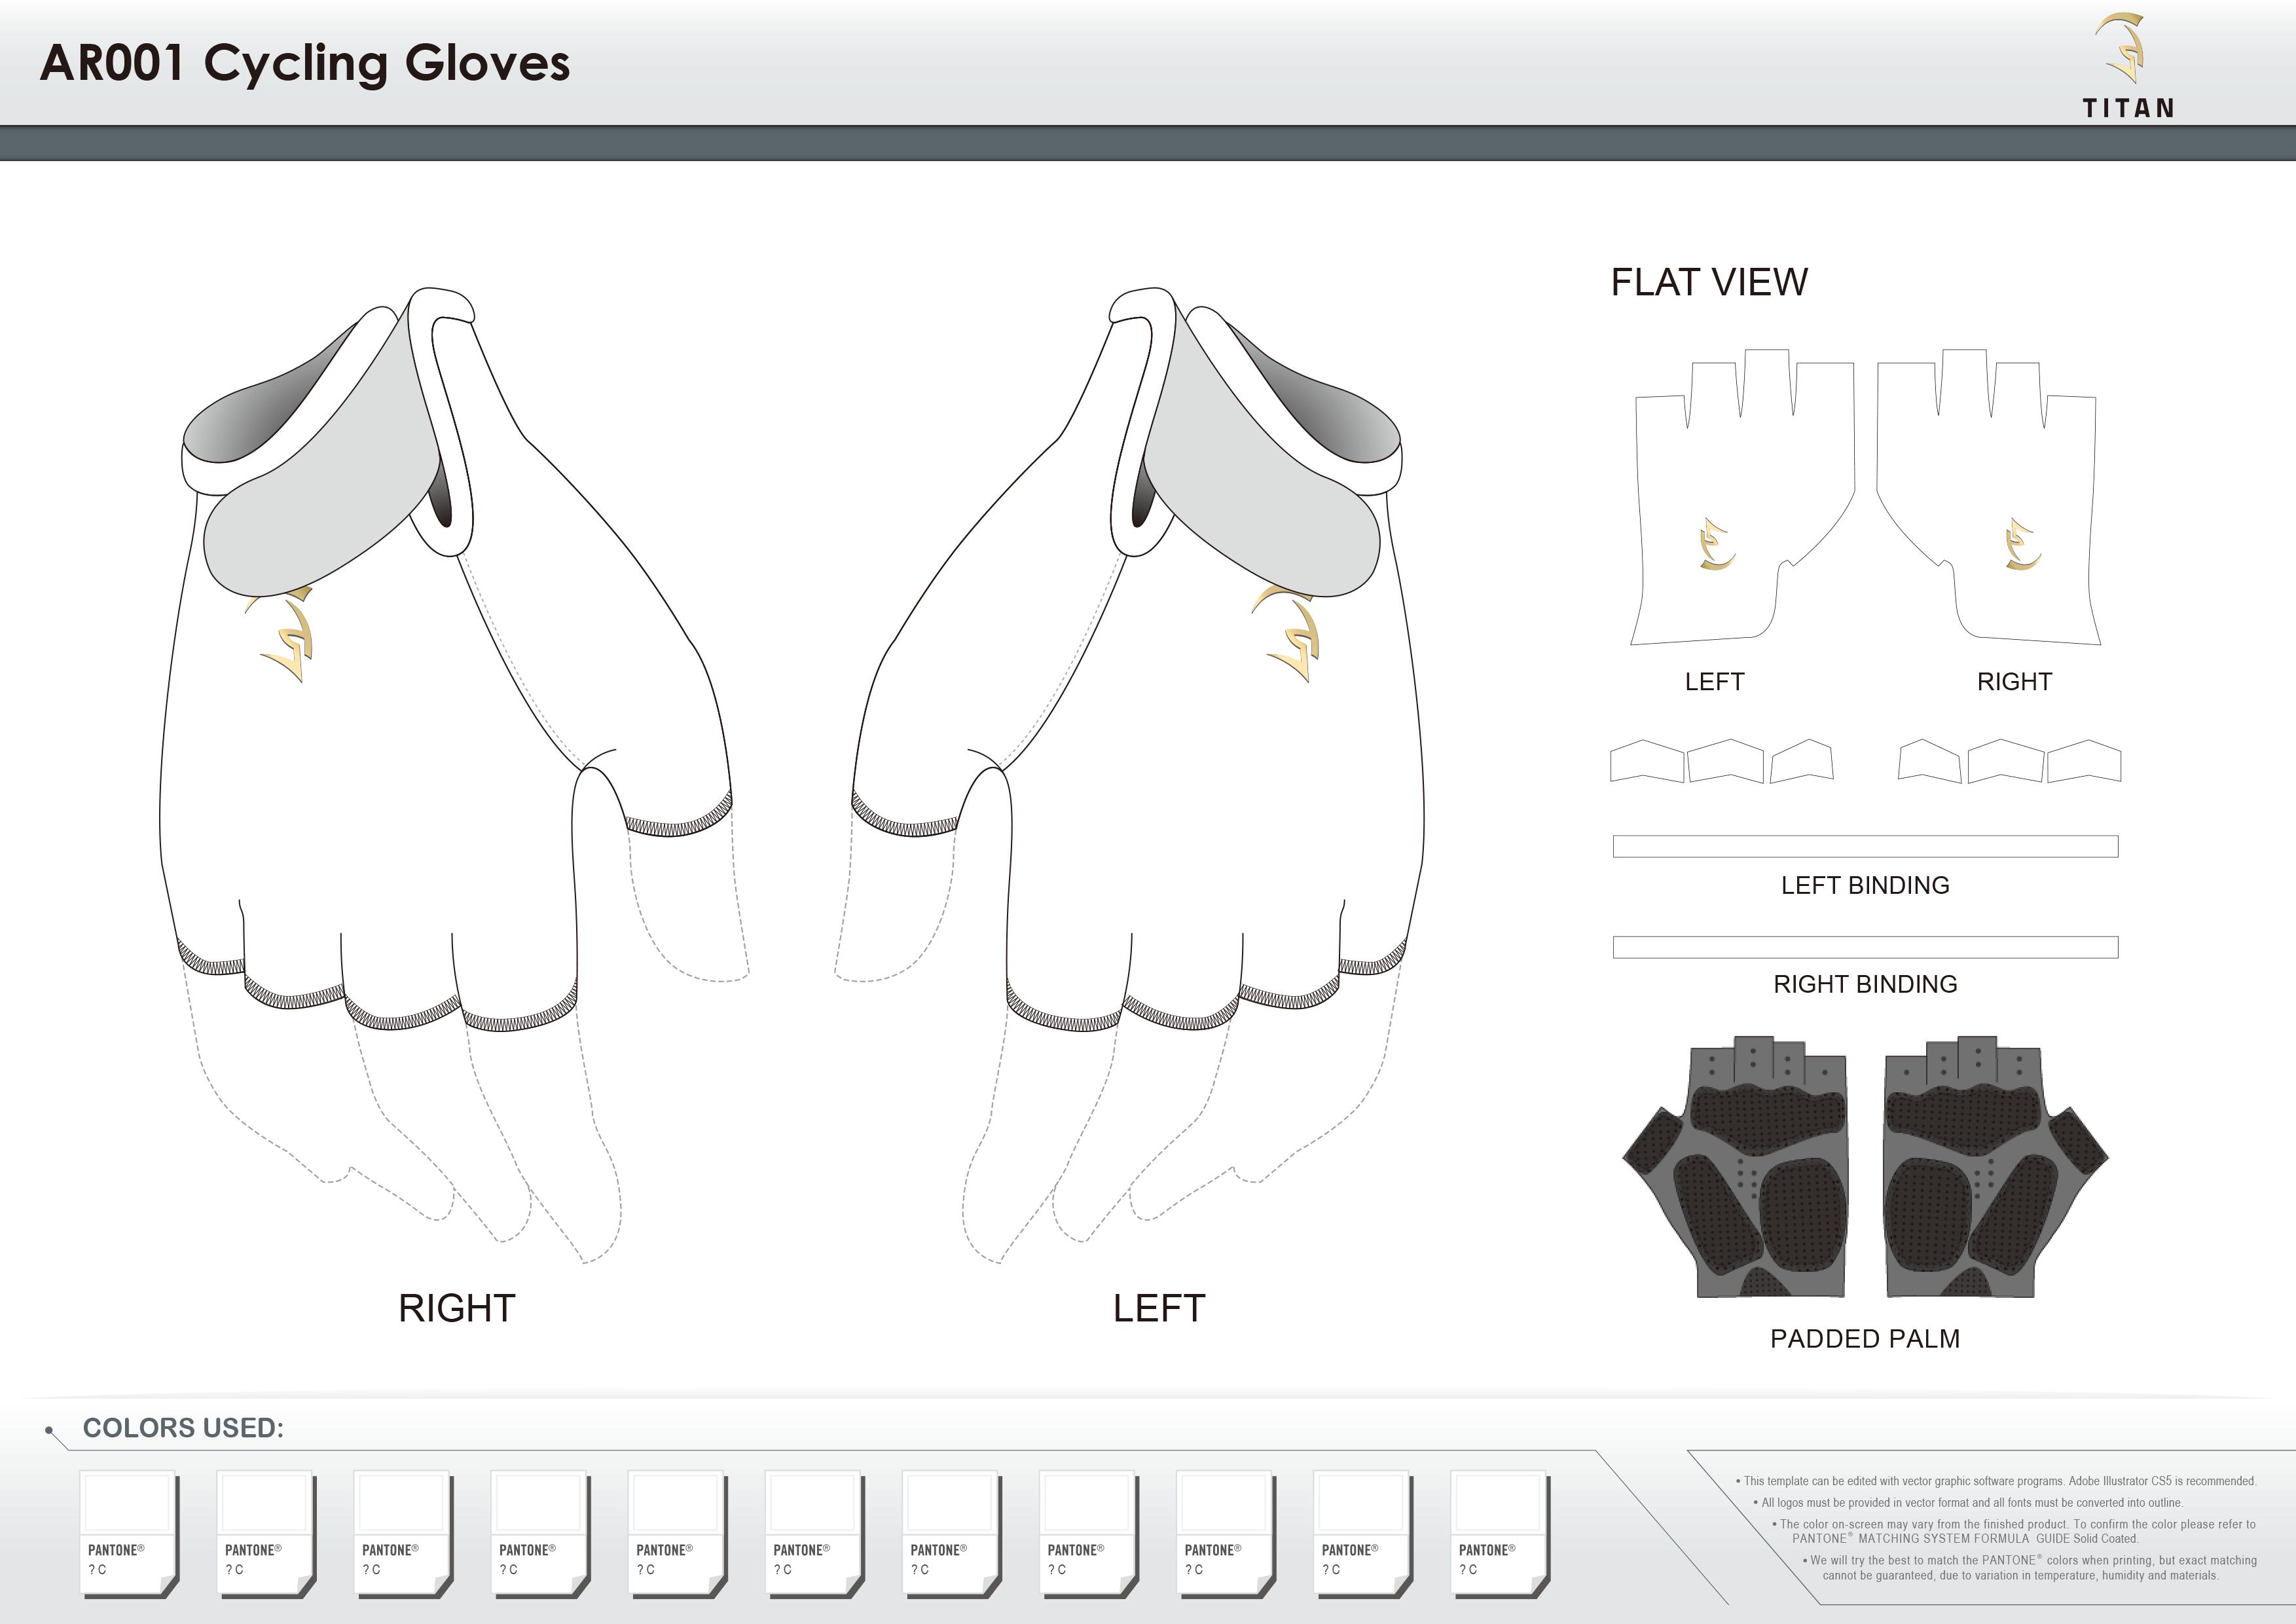 AR001 Cycling Gloves